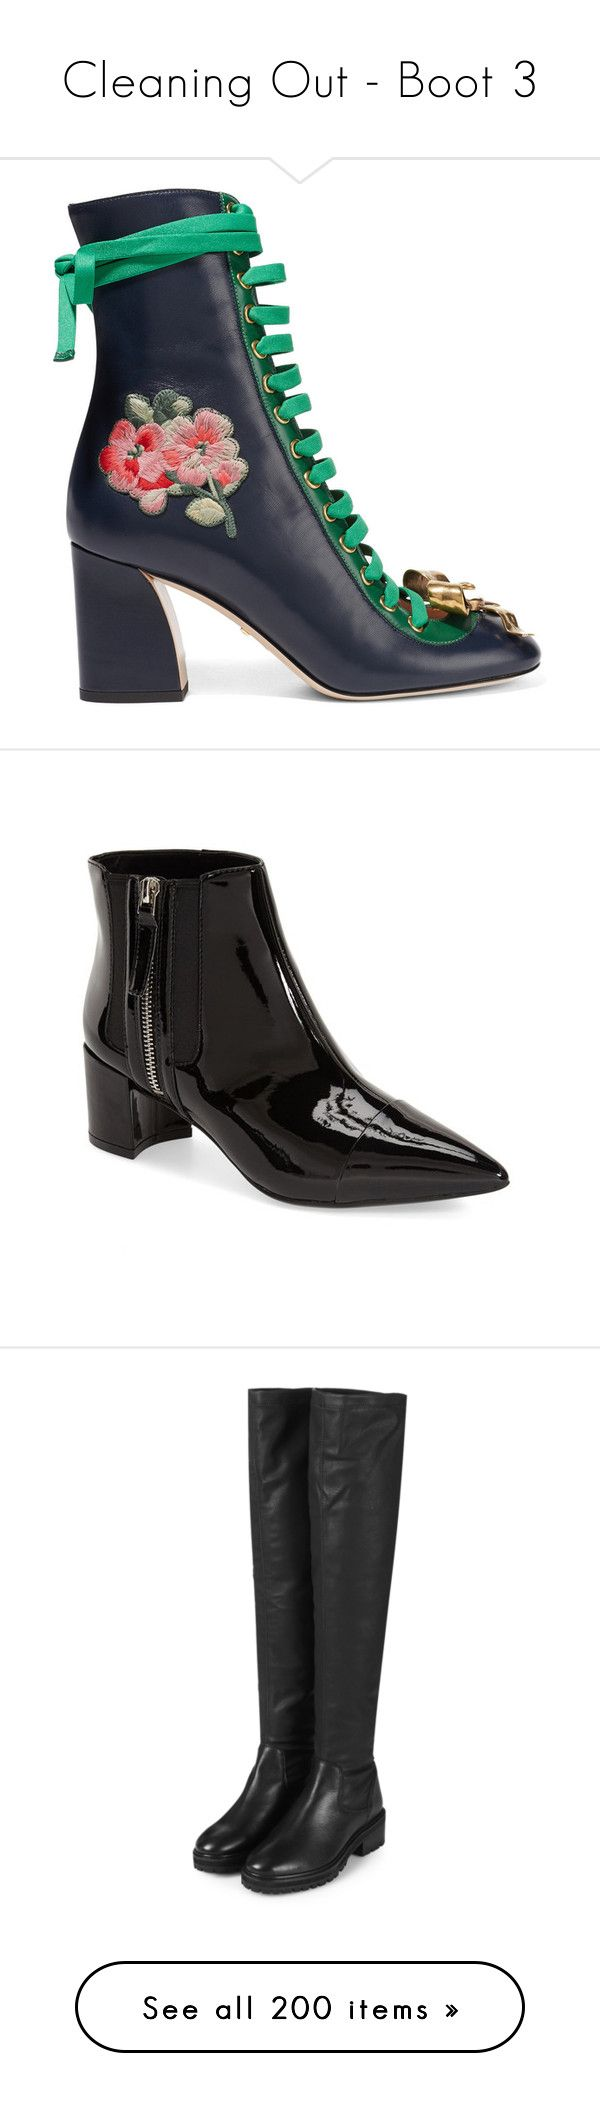 Bitching Black Heel Shoes Images